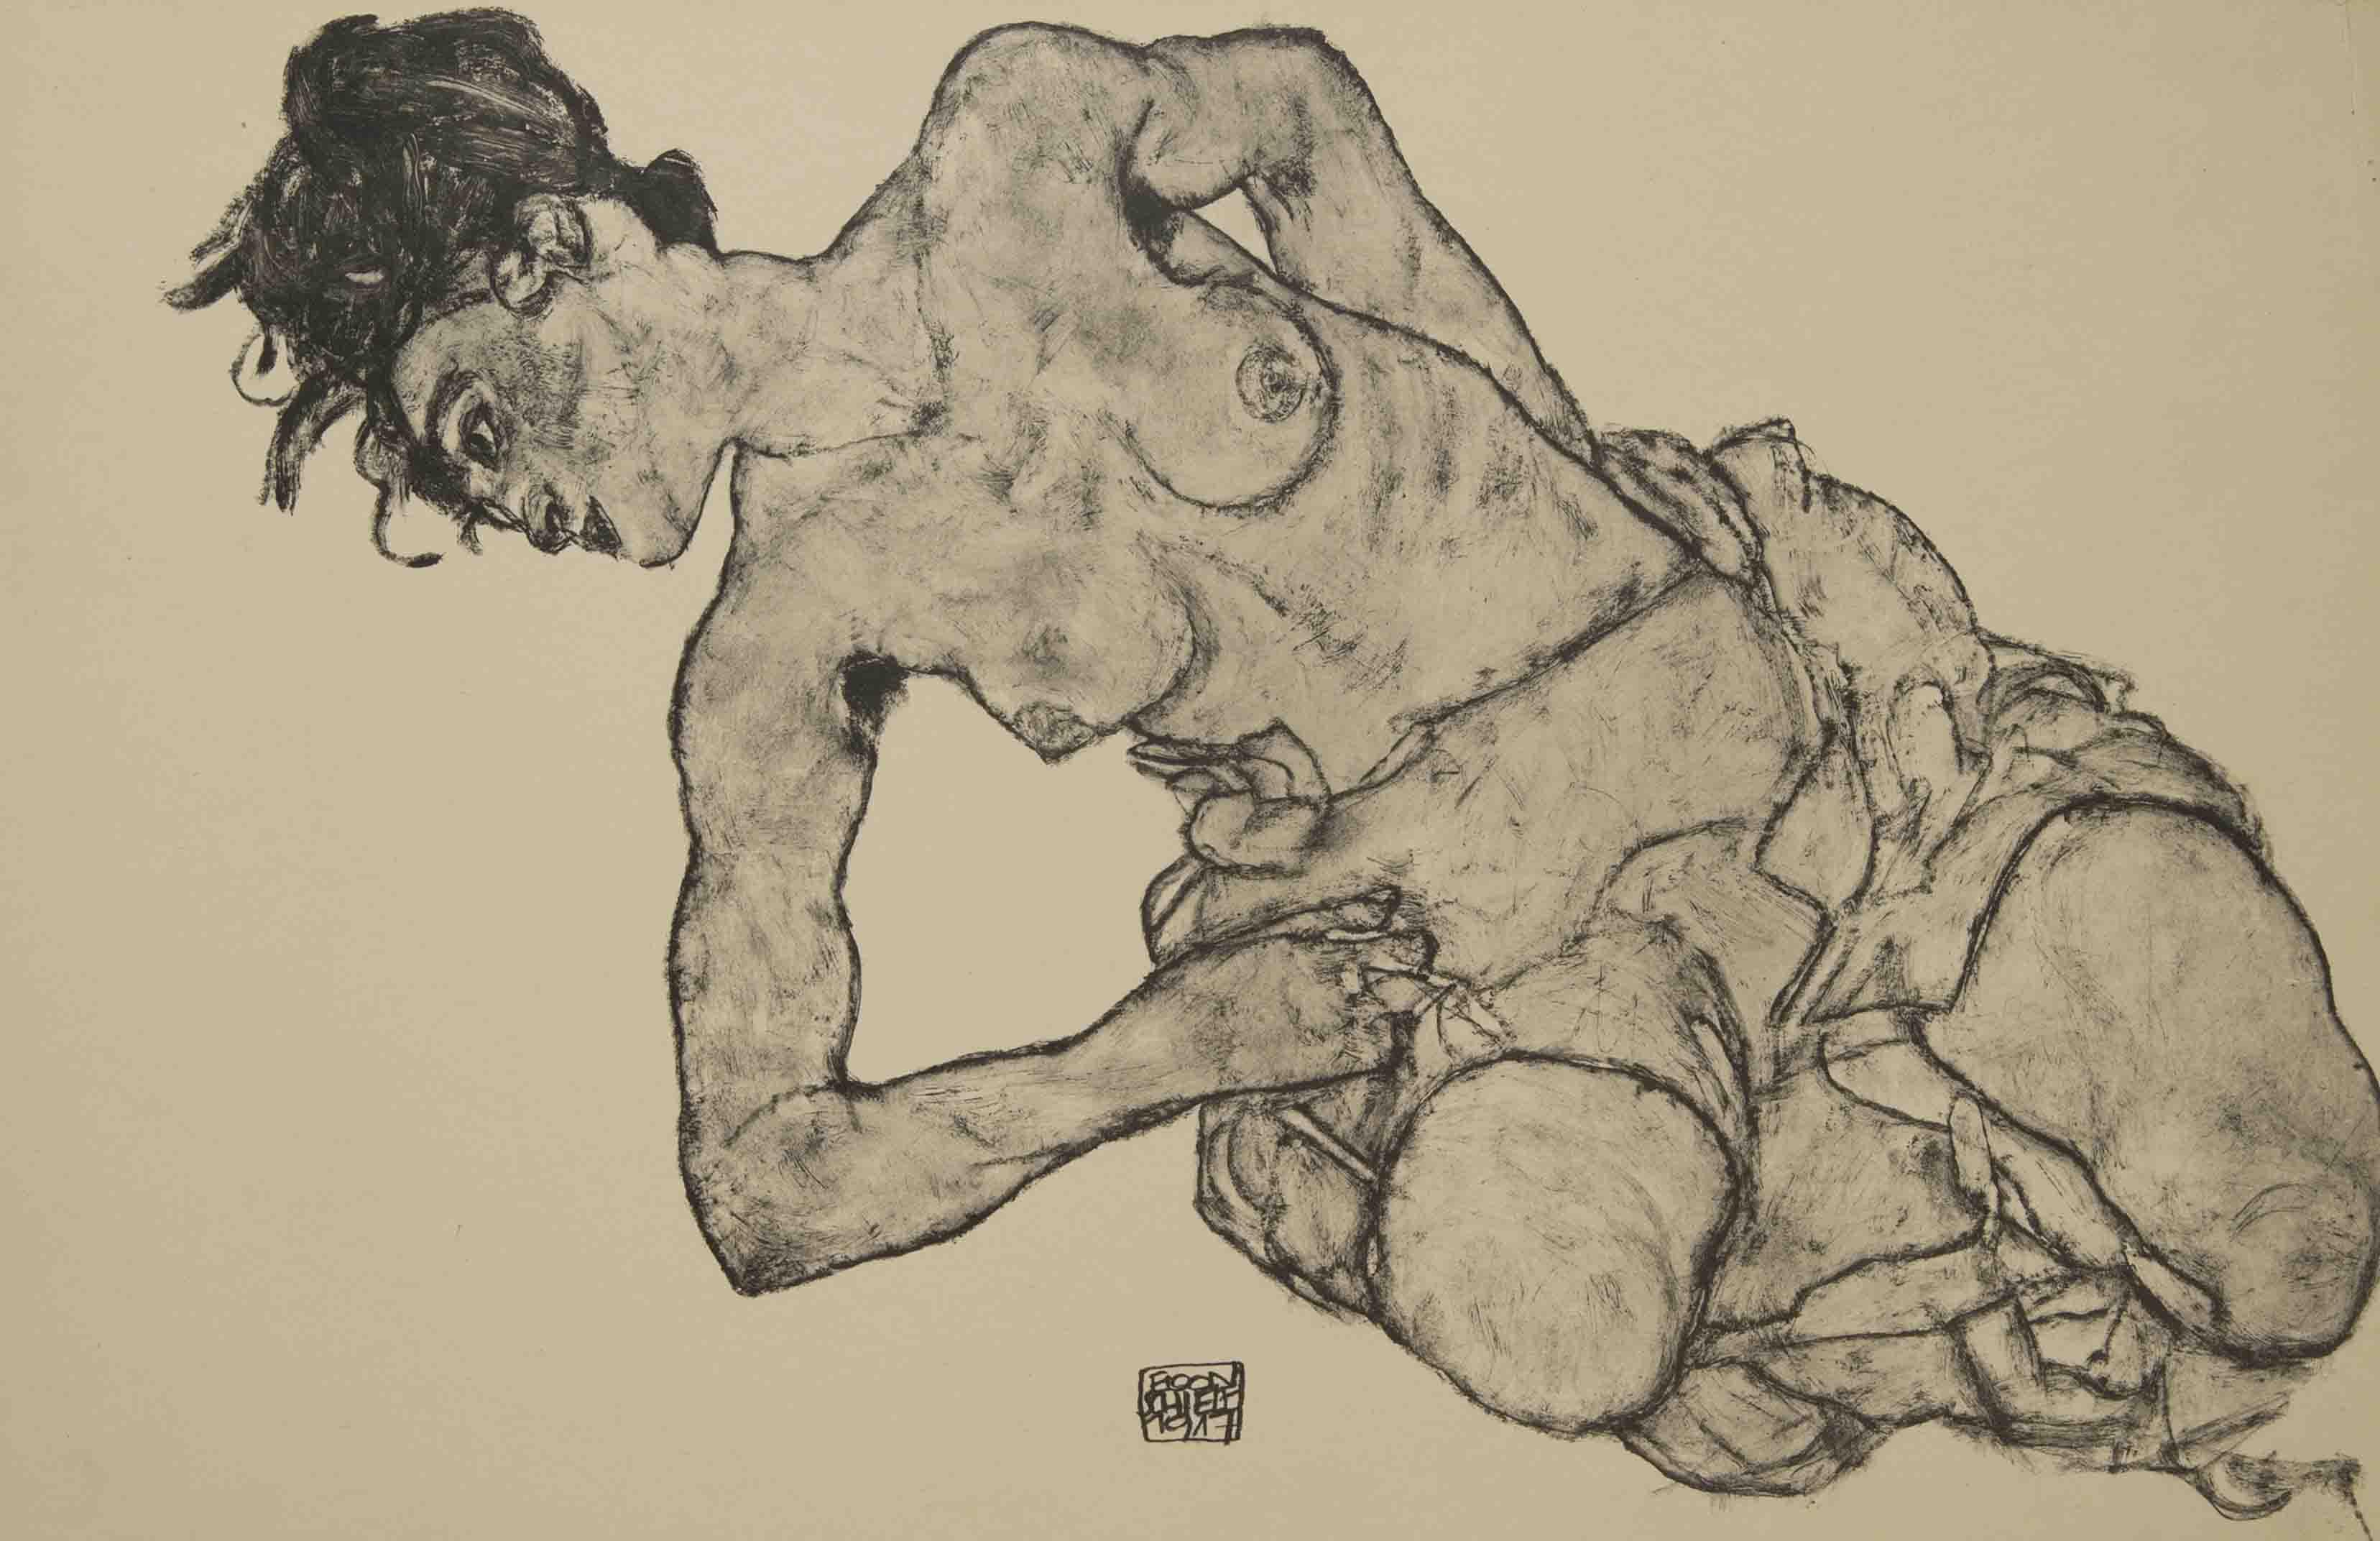 Egon Schiele - Nude, From the portfolio Zeichnungen (drawings),1917 incluing 12 Heliotypes, Ed° Librairie Richard Lanyi,Vienne, 1917.